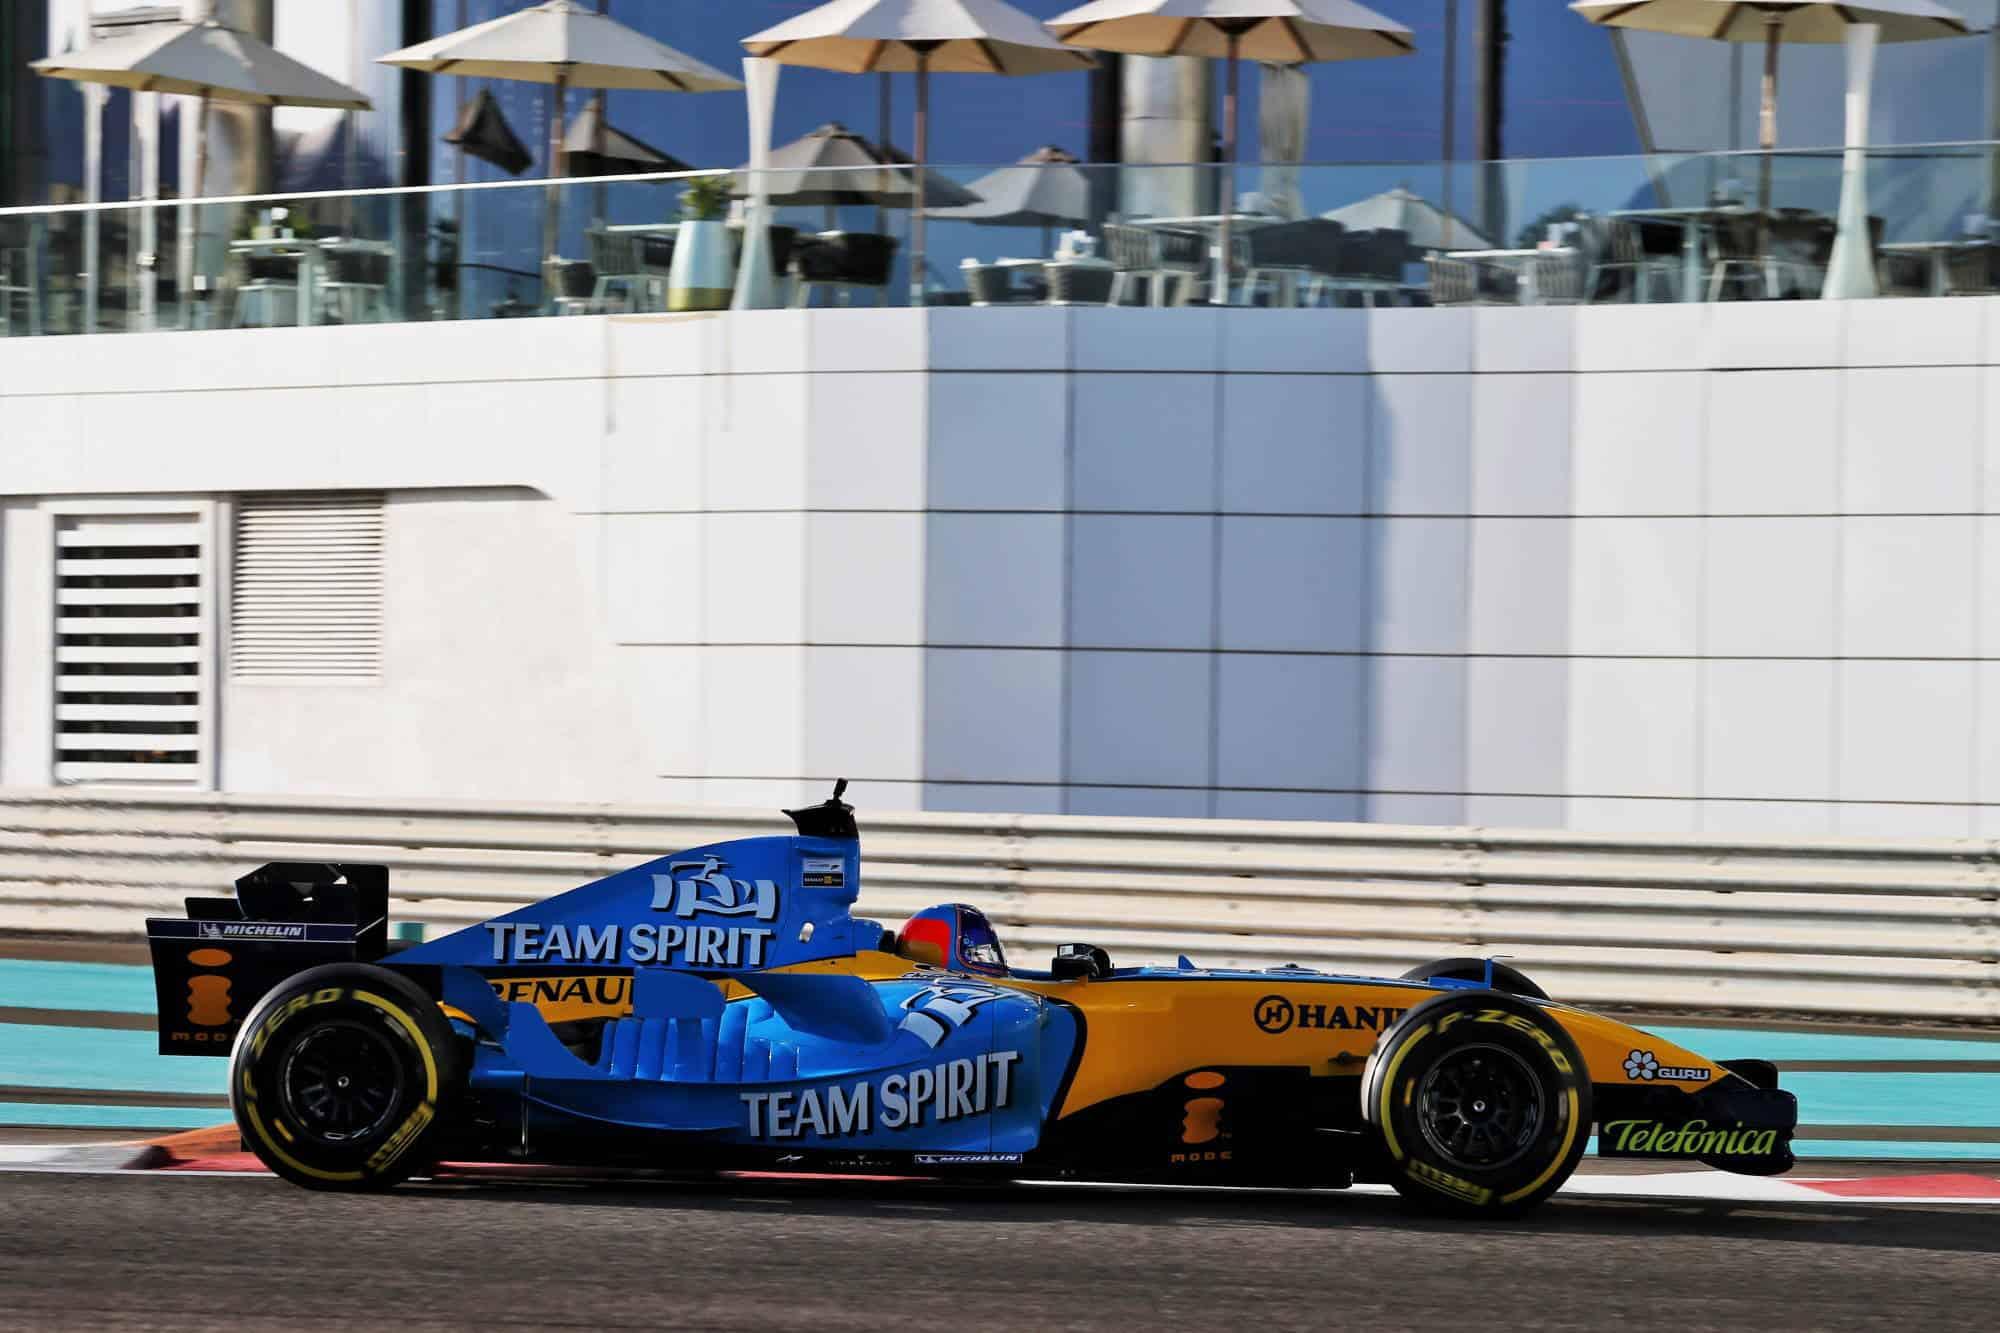 2020 Abu Dhabi GP Alonso Renault R25 demo run side view 2000 px Photo Renault